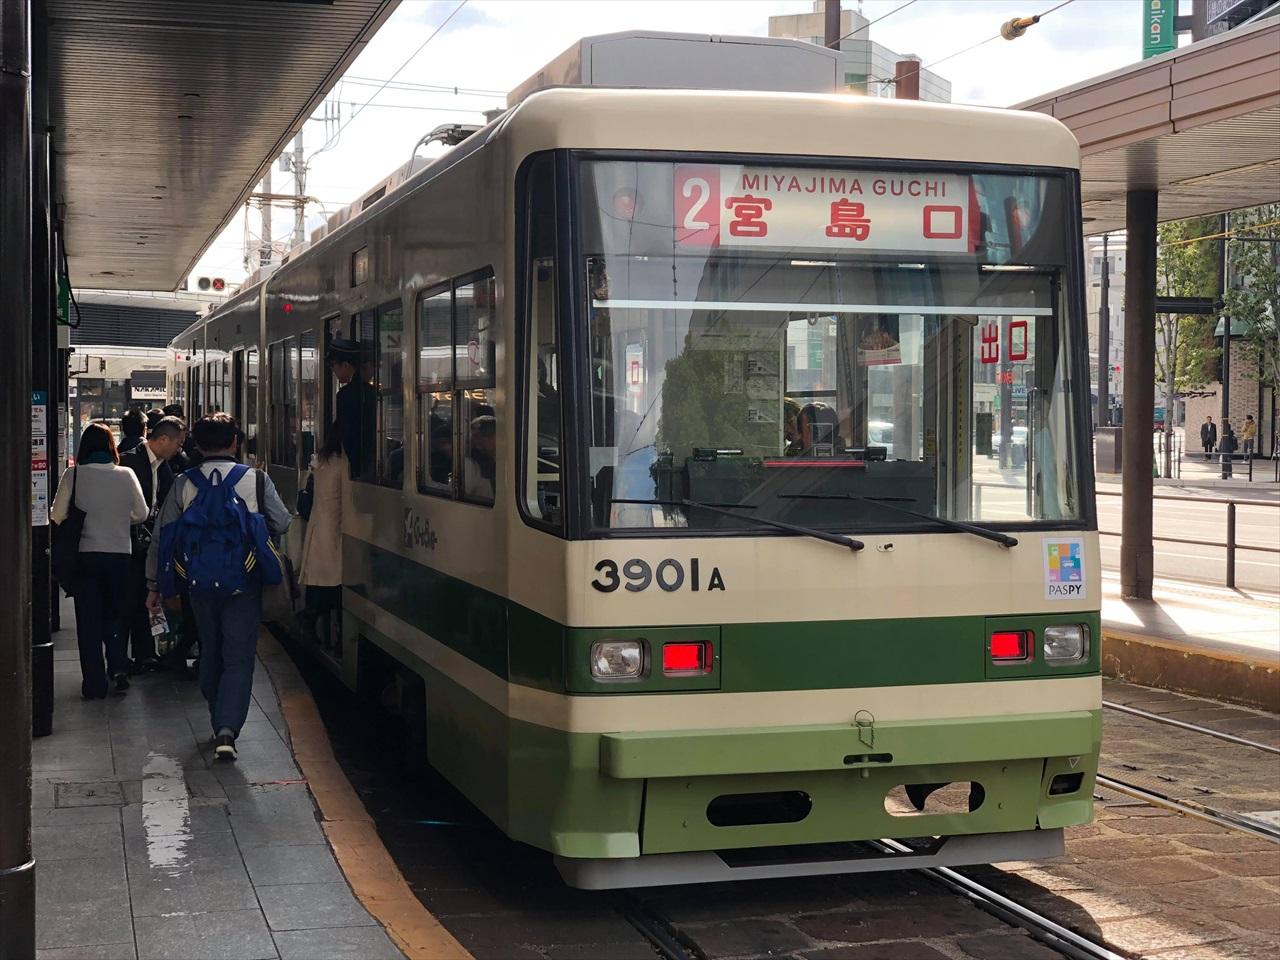 #2 - 広島駅 in 2015